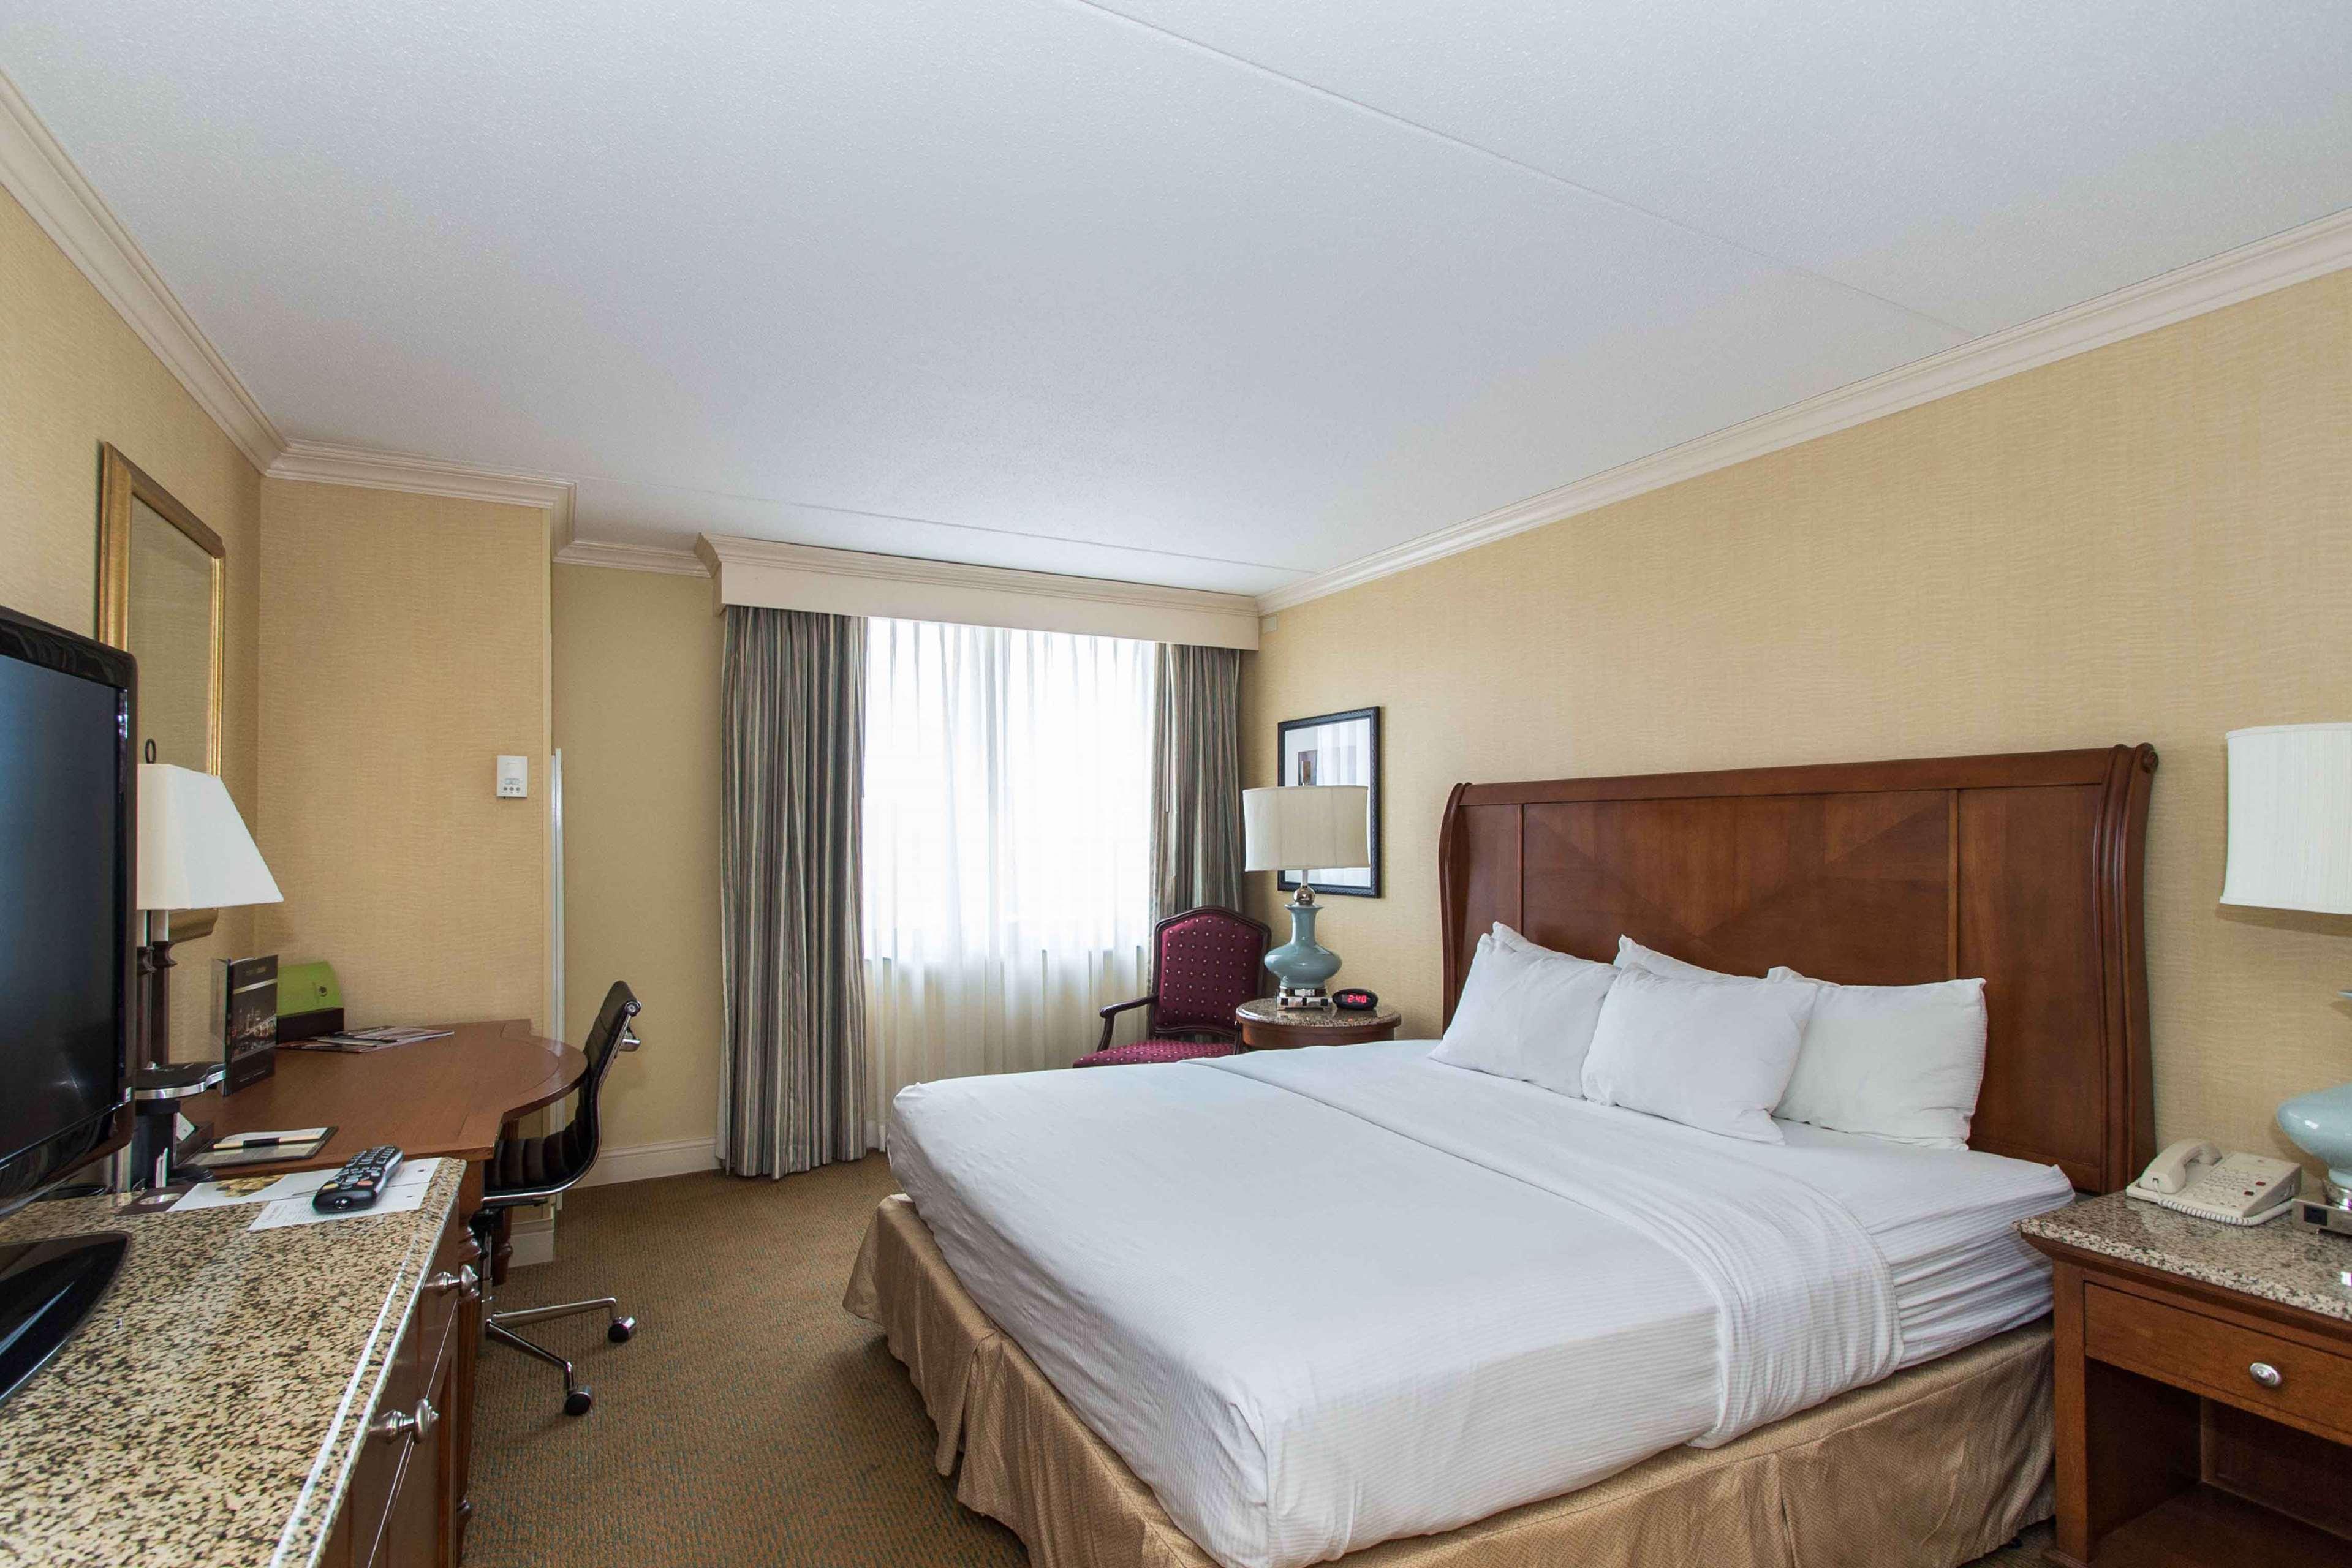 DoubleTree by Hilton Hotel Cleveland East Beachwood image 37